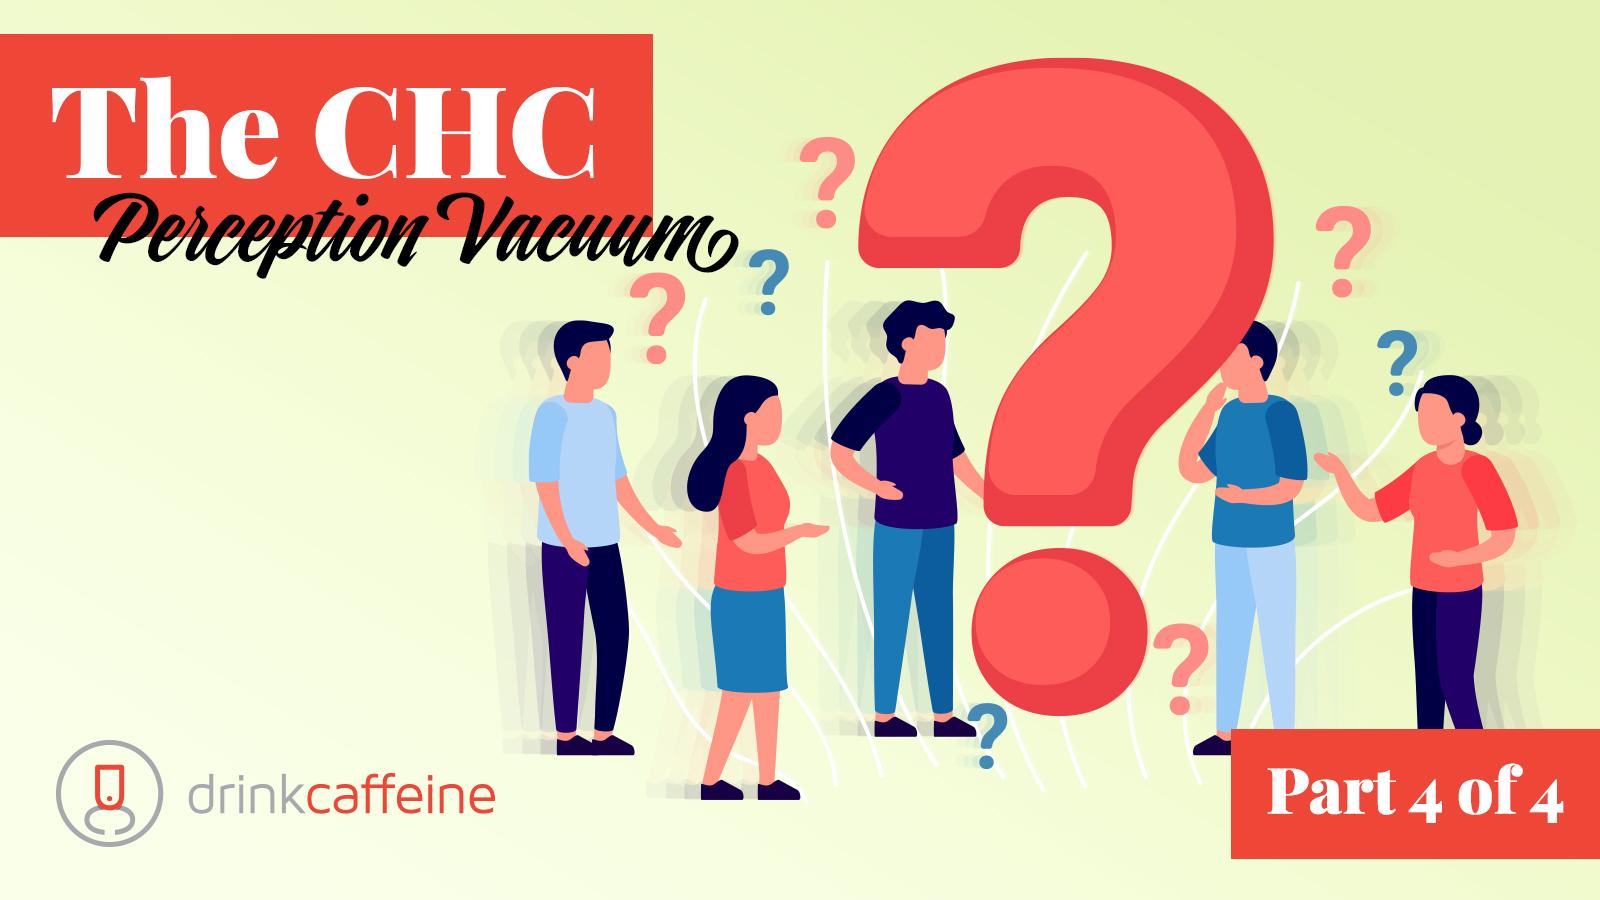 The CHC Perception Vacuum: Part 4 blog image